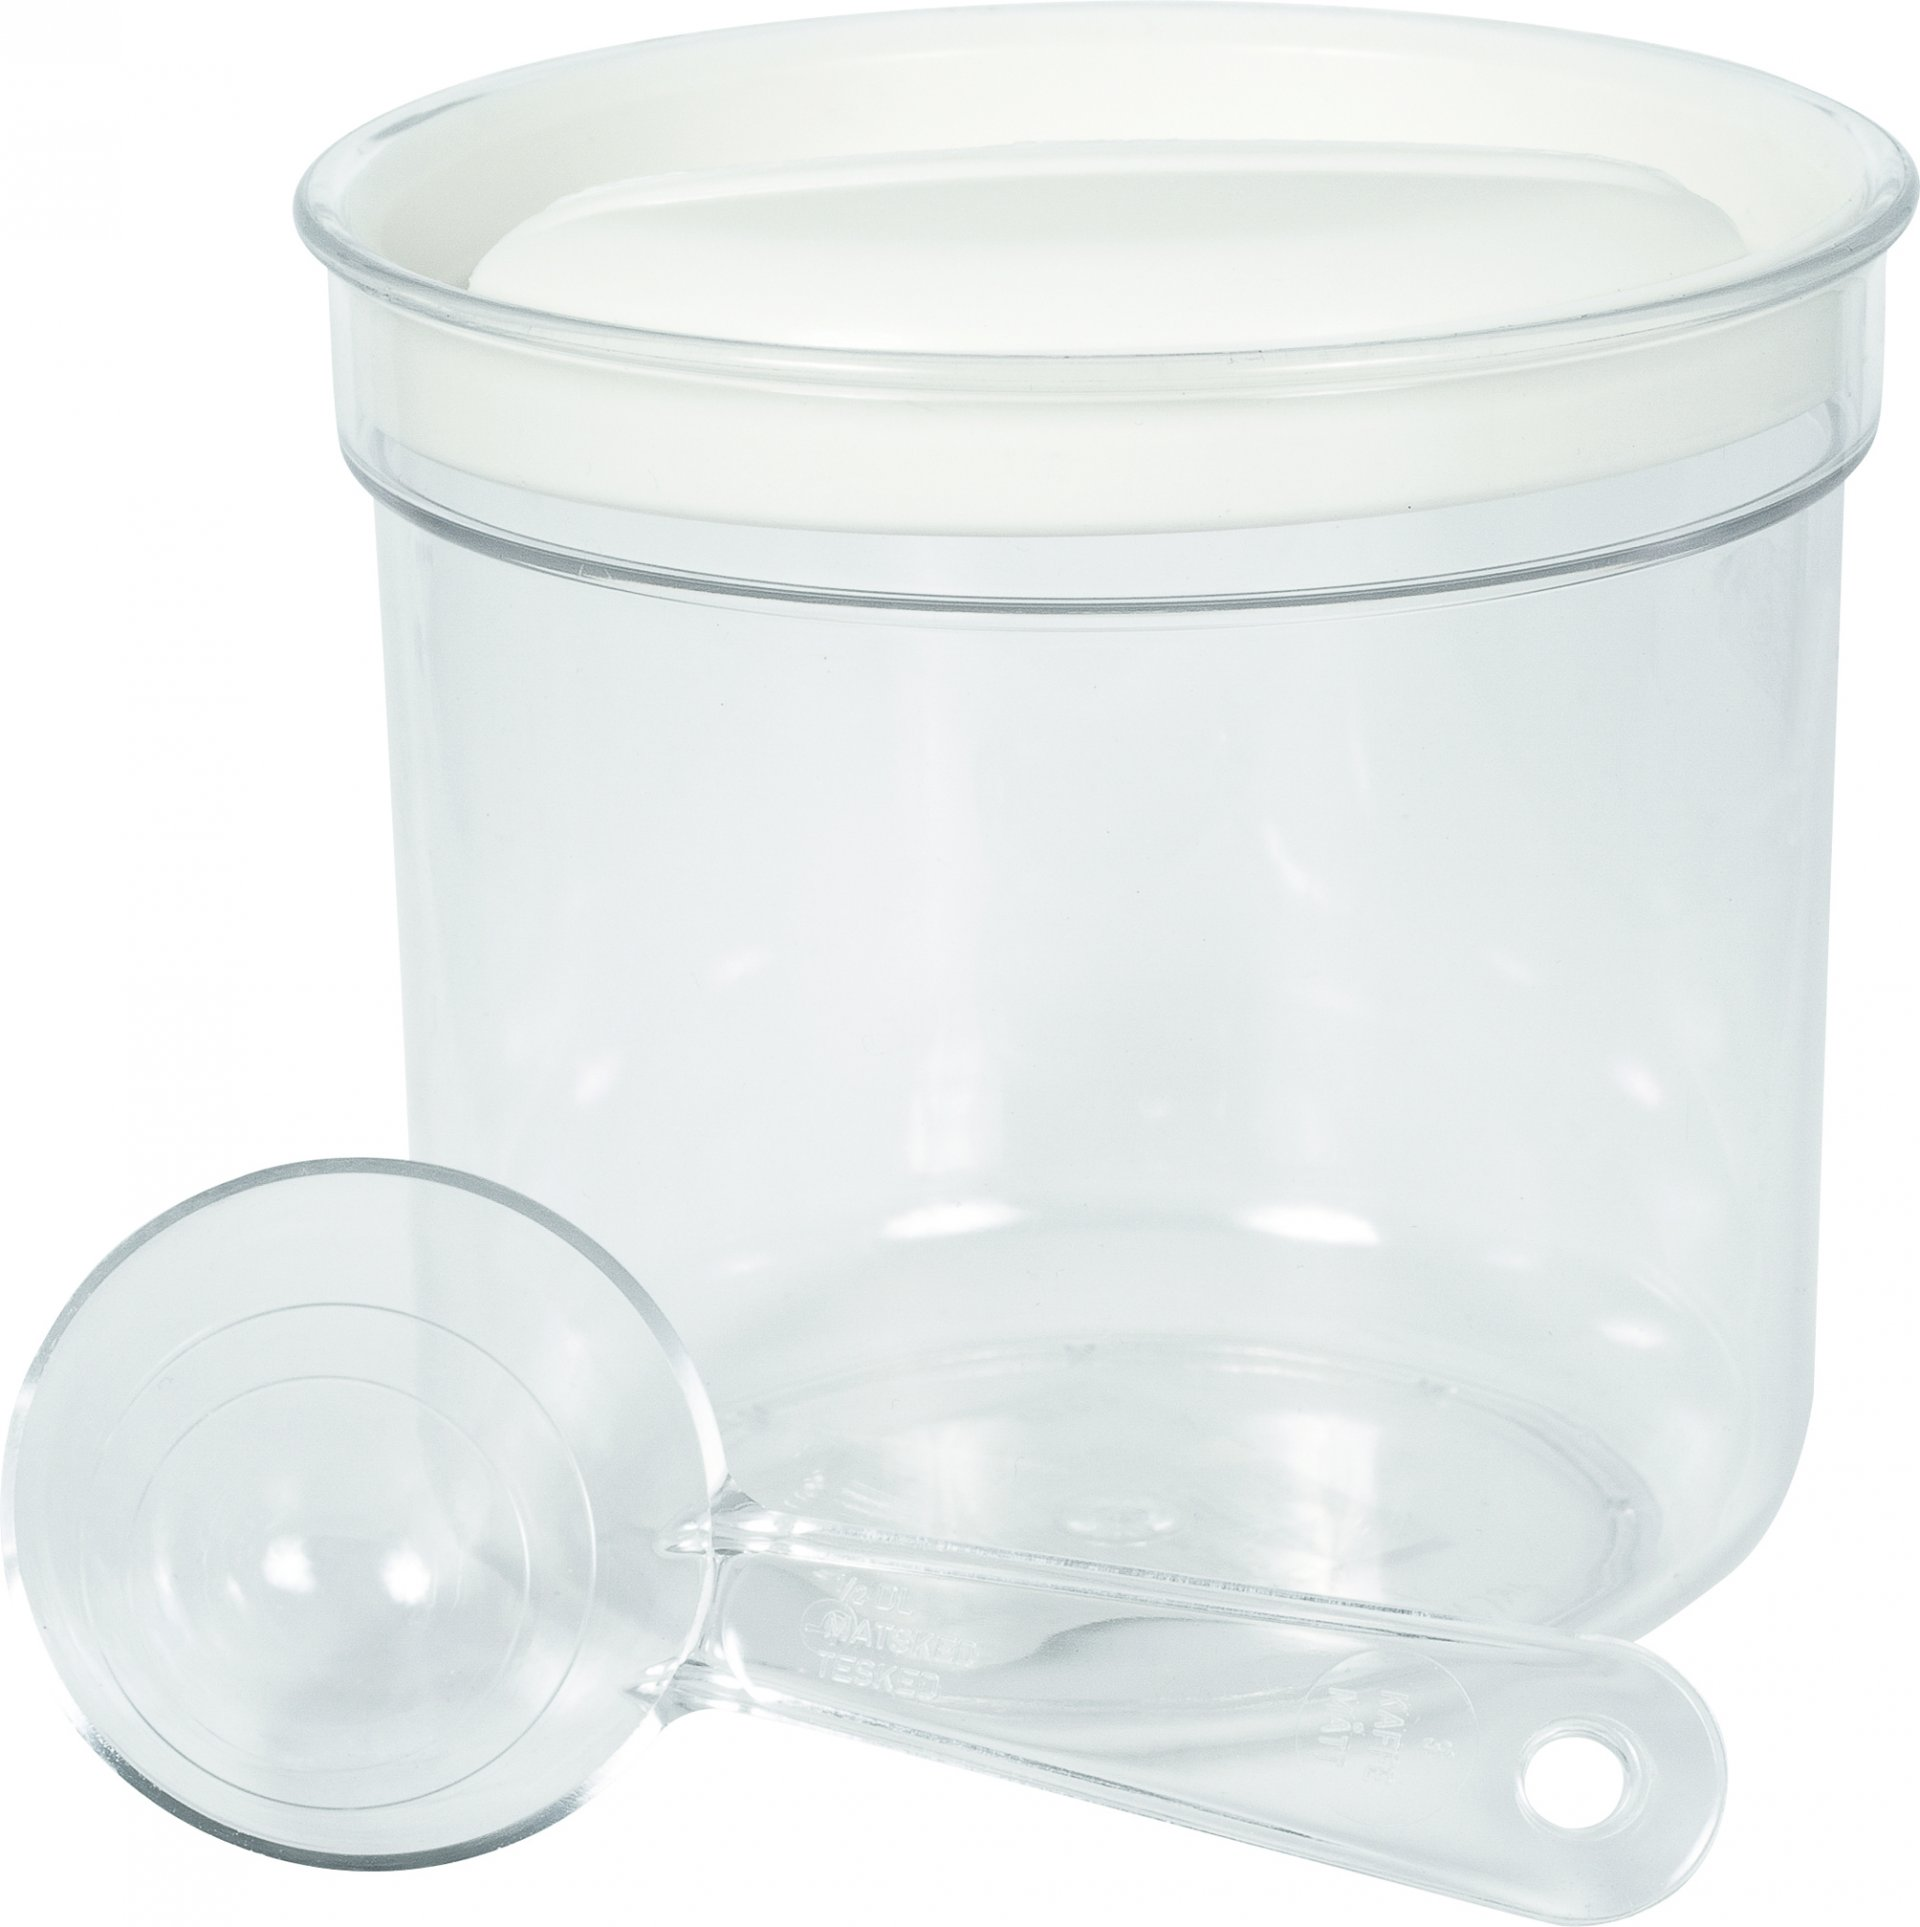 Curver box na potraviny, průhledný, 1l